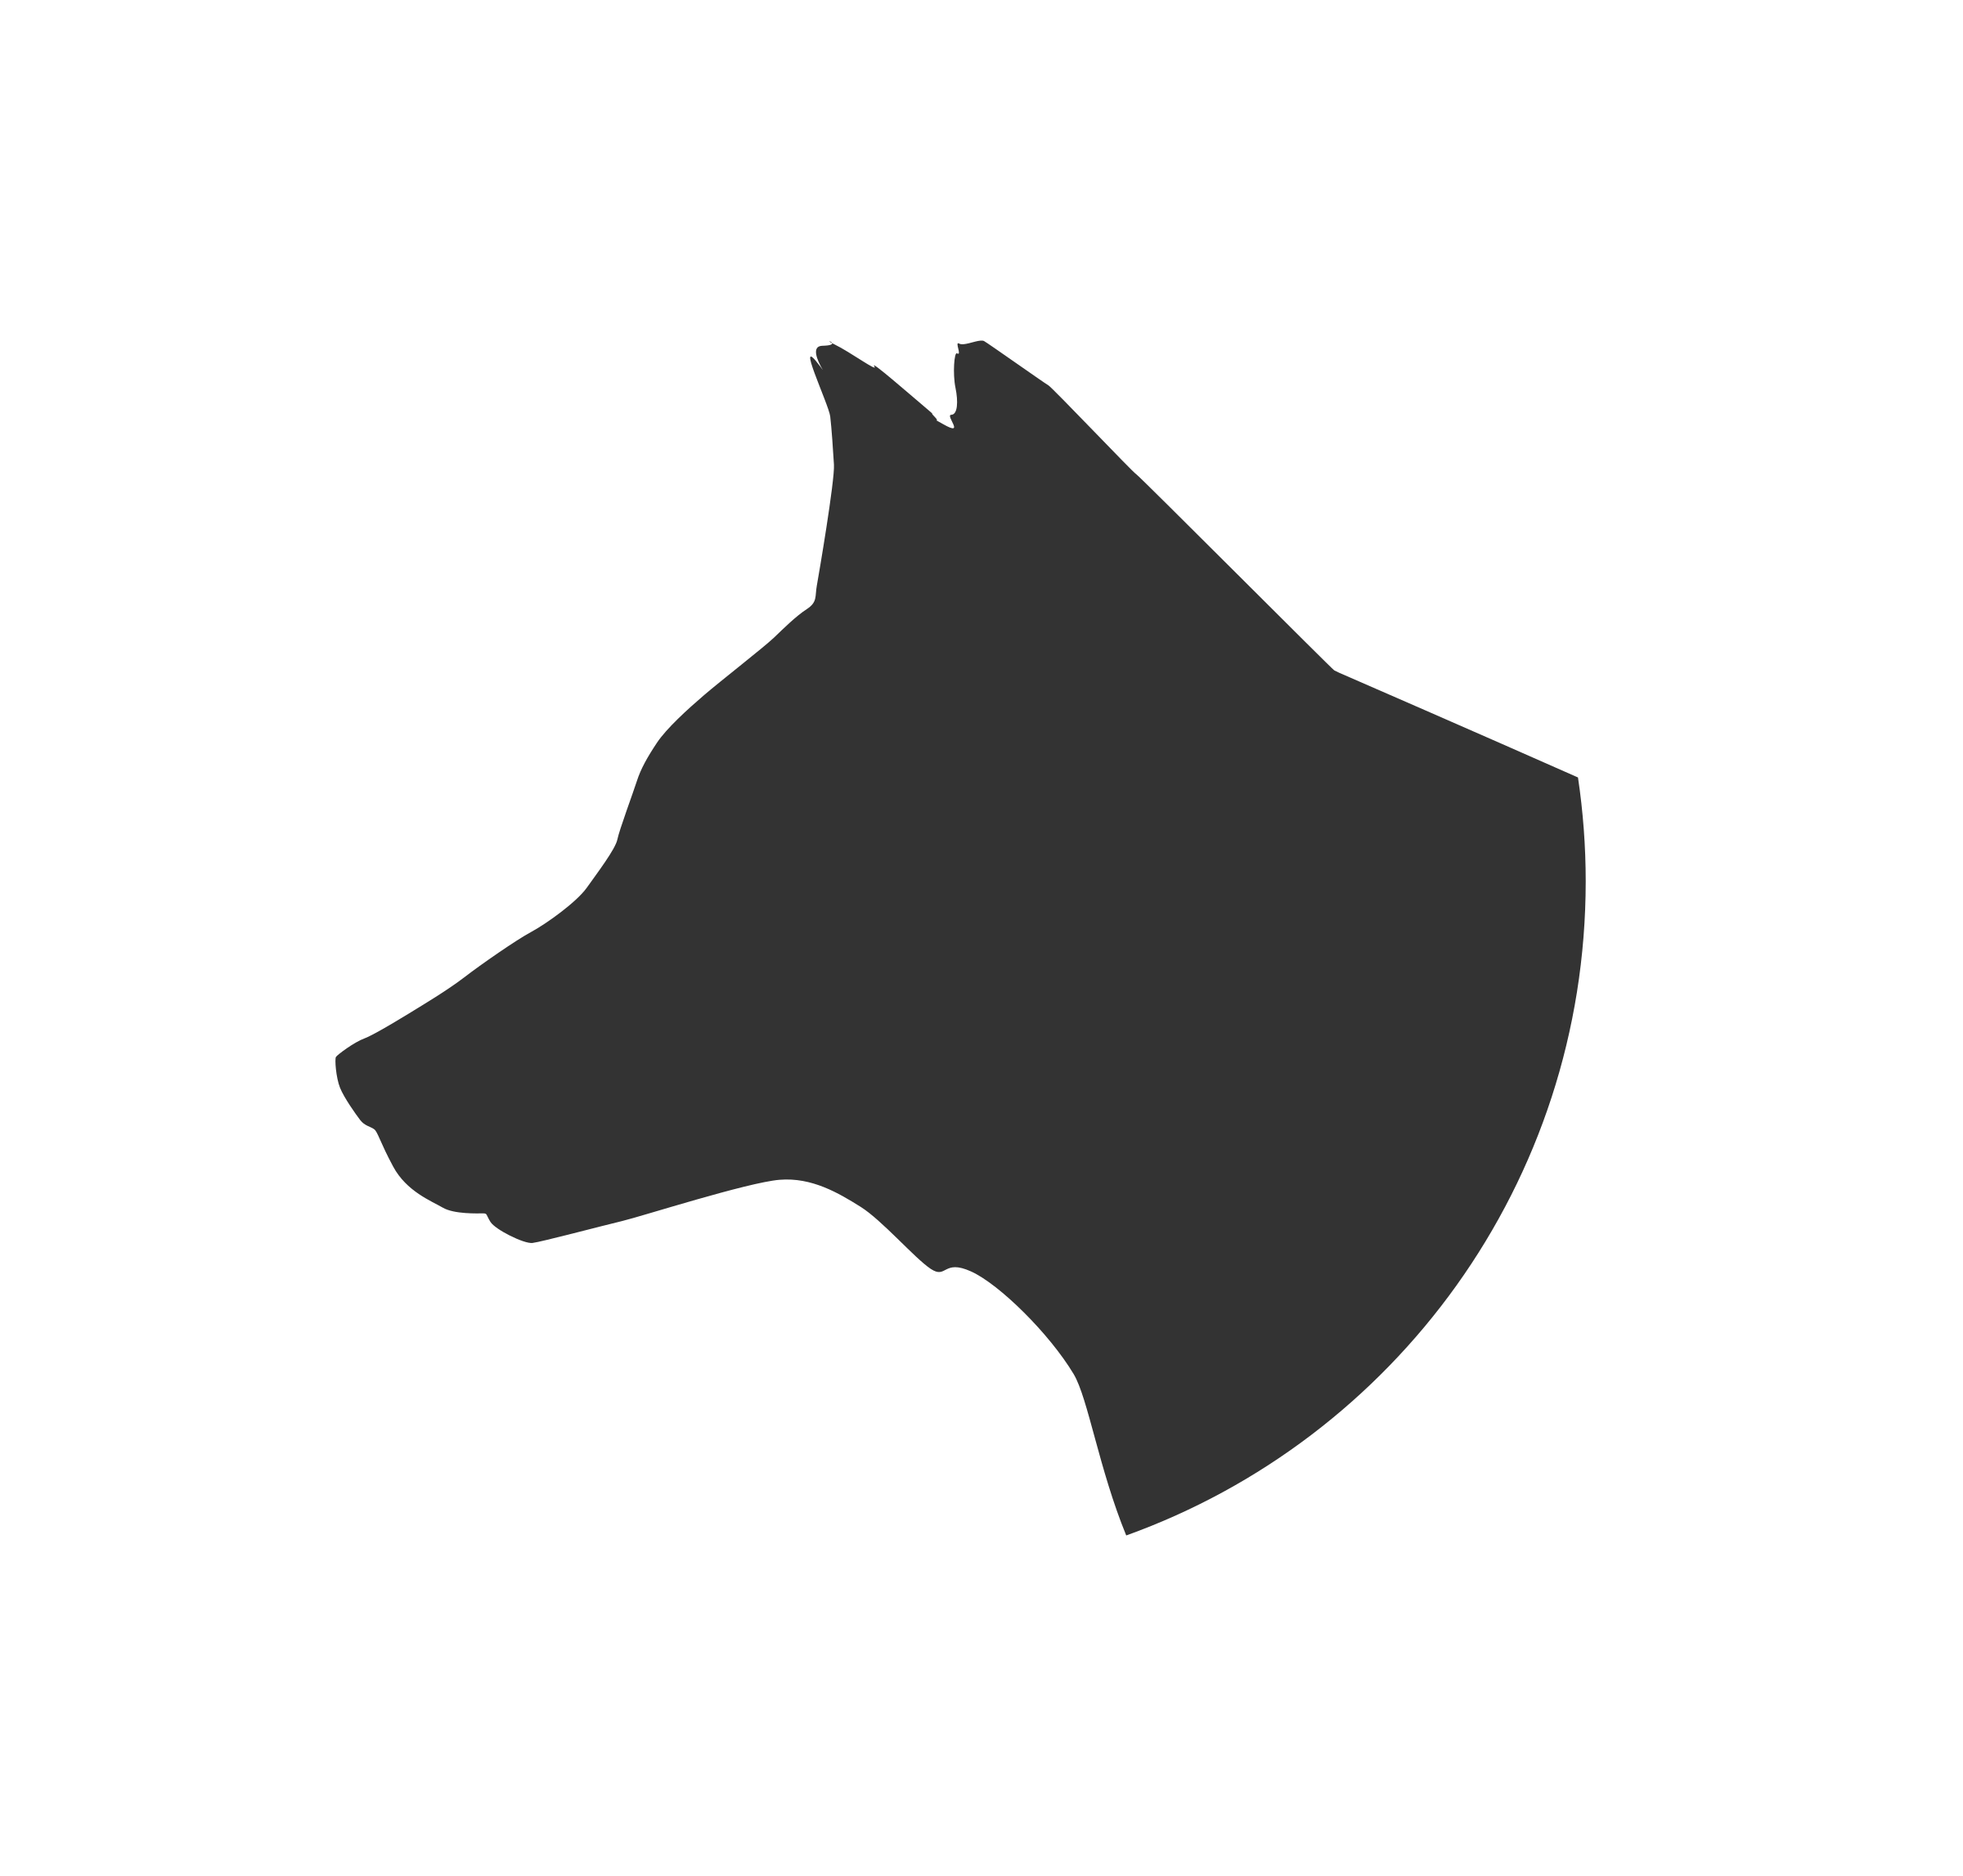 Bernese mountain dog clipart clip art free stock Boxer Dalmatian dog Bernese Mountain Dog Clip art - husky 2400*2294 ... clip art free stock